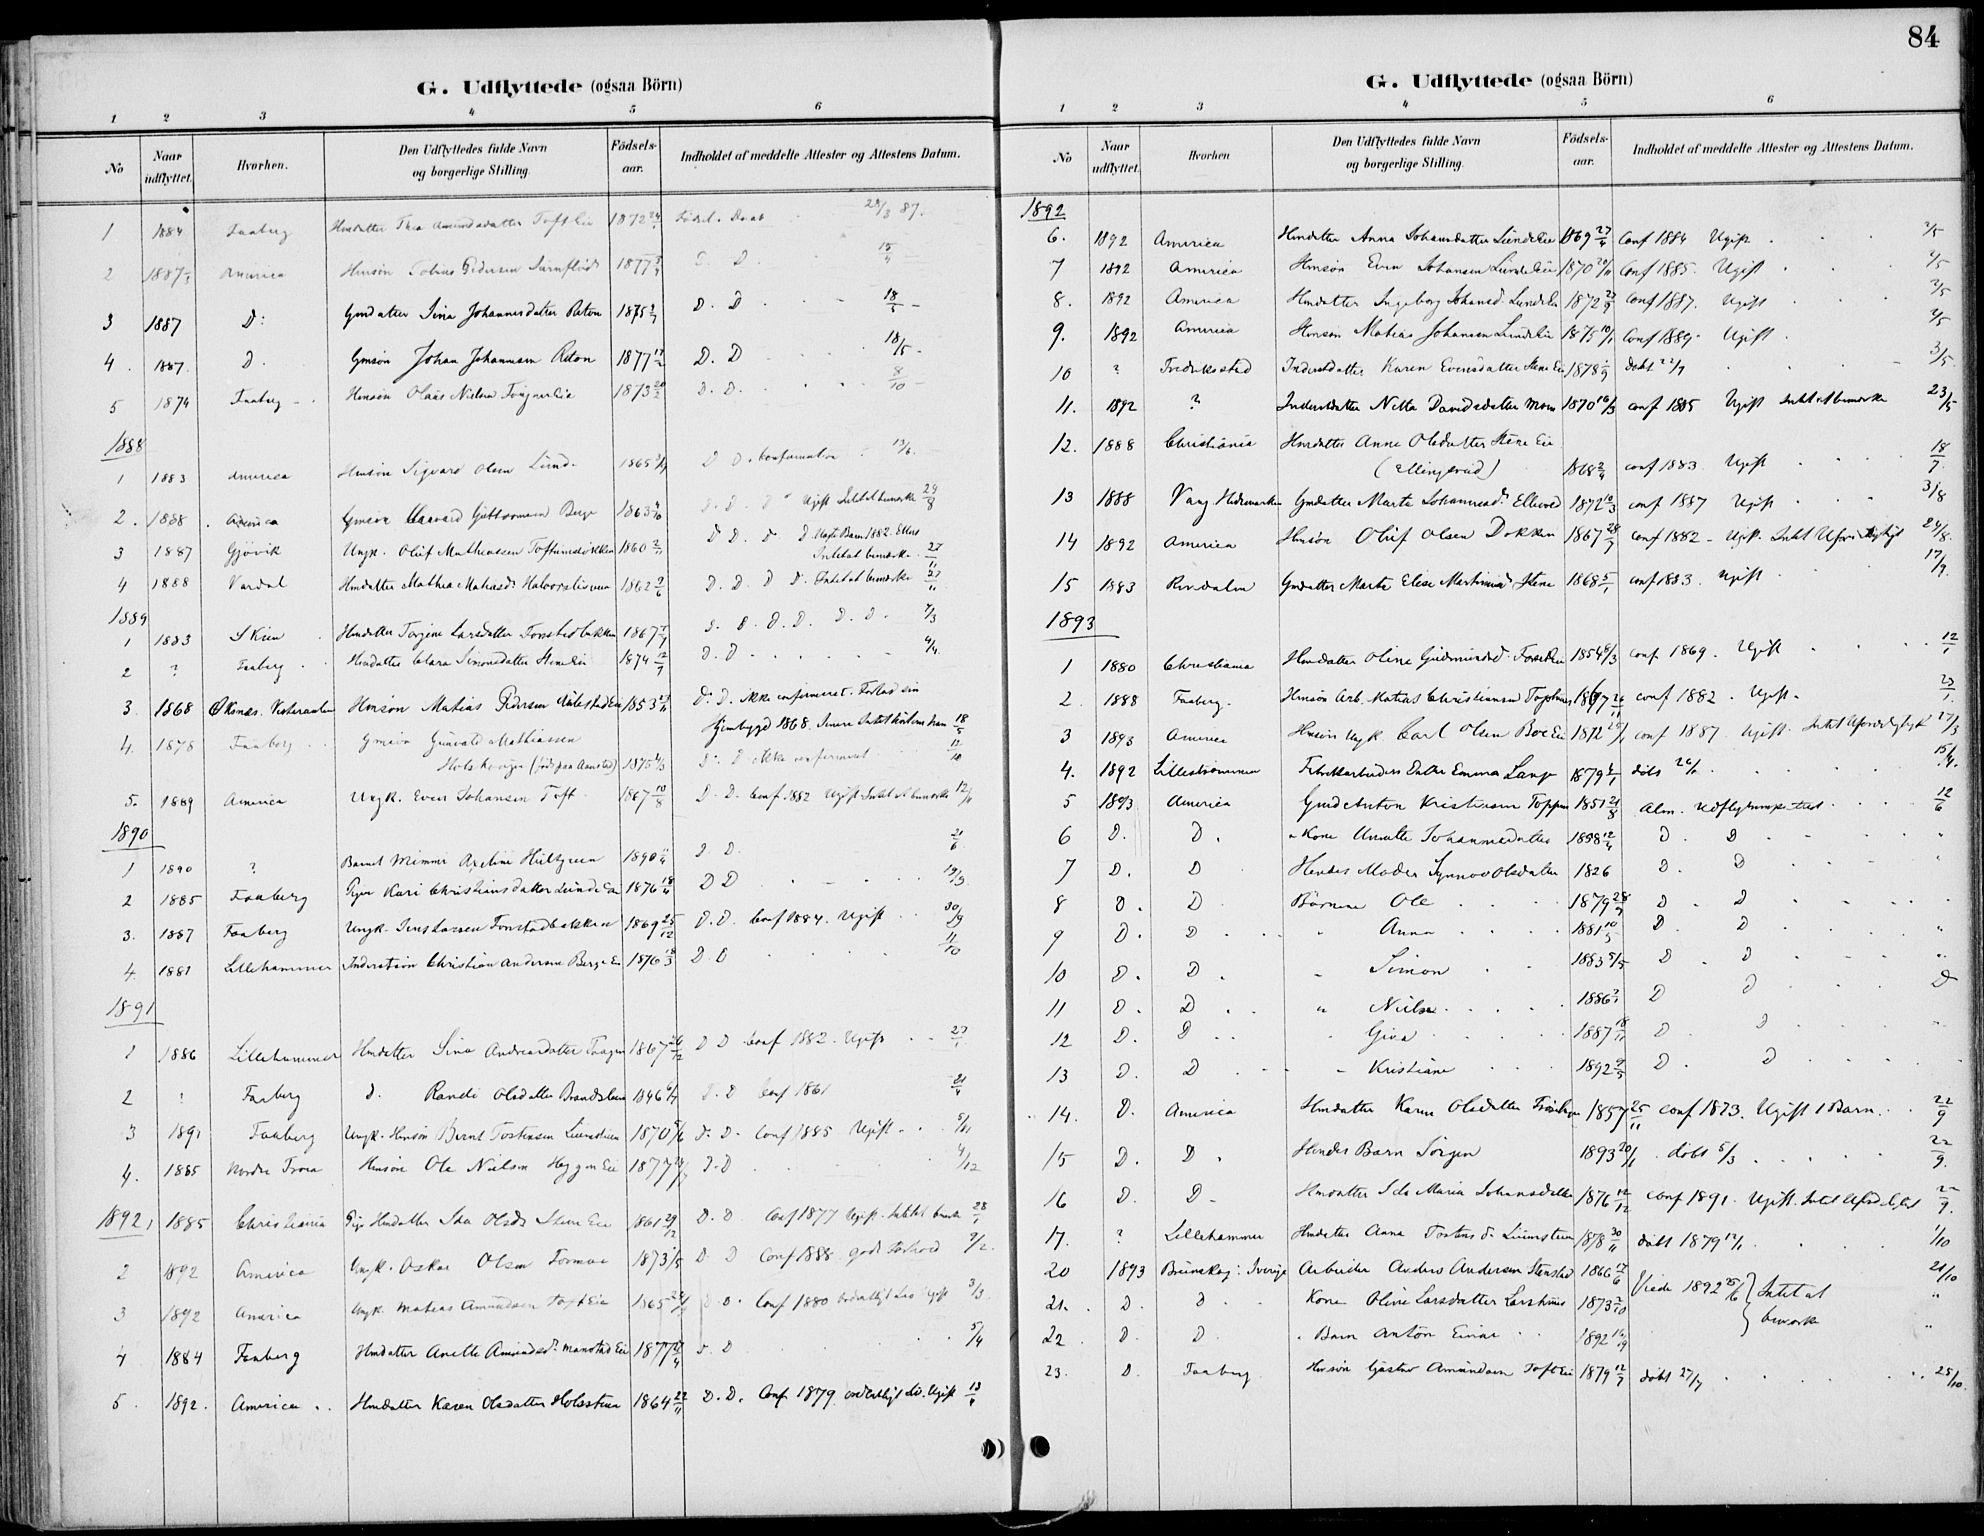 SAH, Østre Gausdal prestekontor, Ministerialbok nr. 3, 1887-1901, s. 84